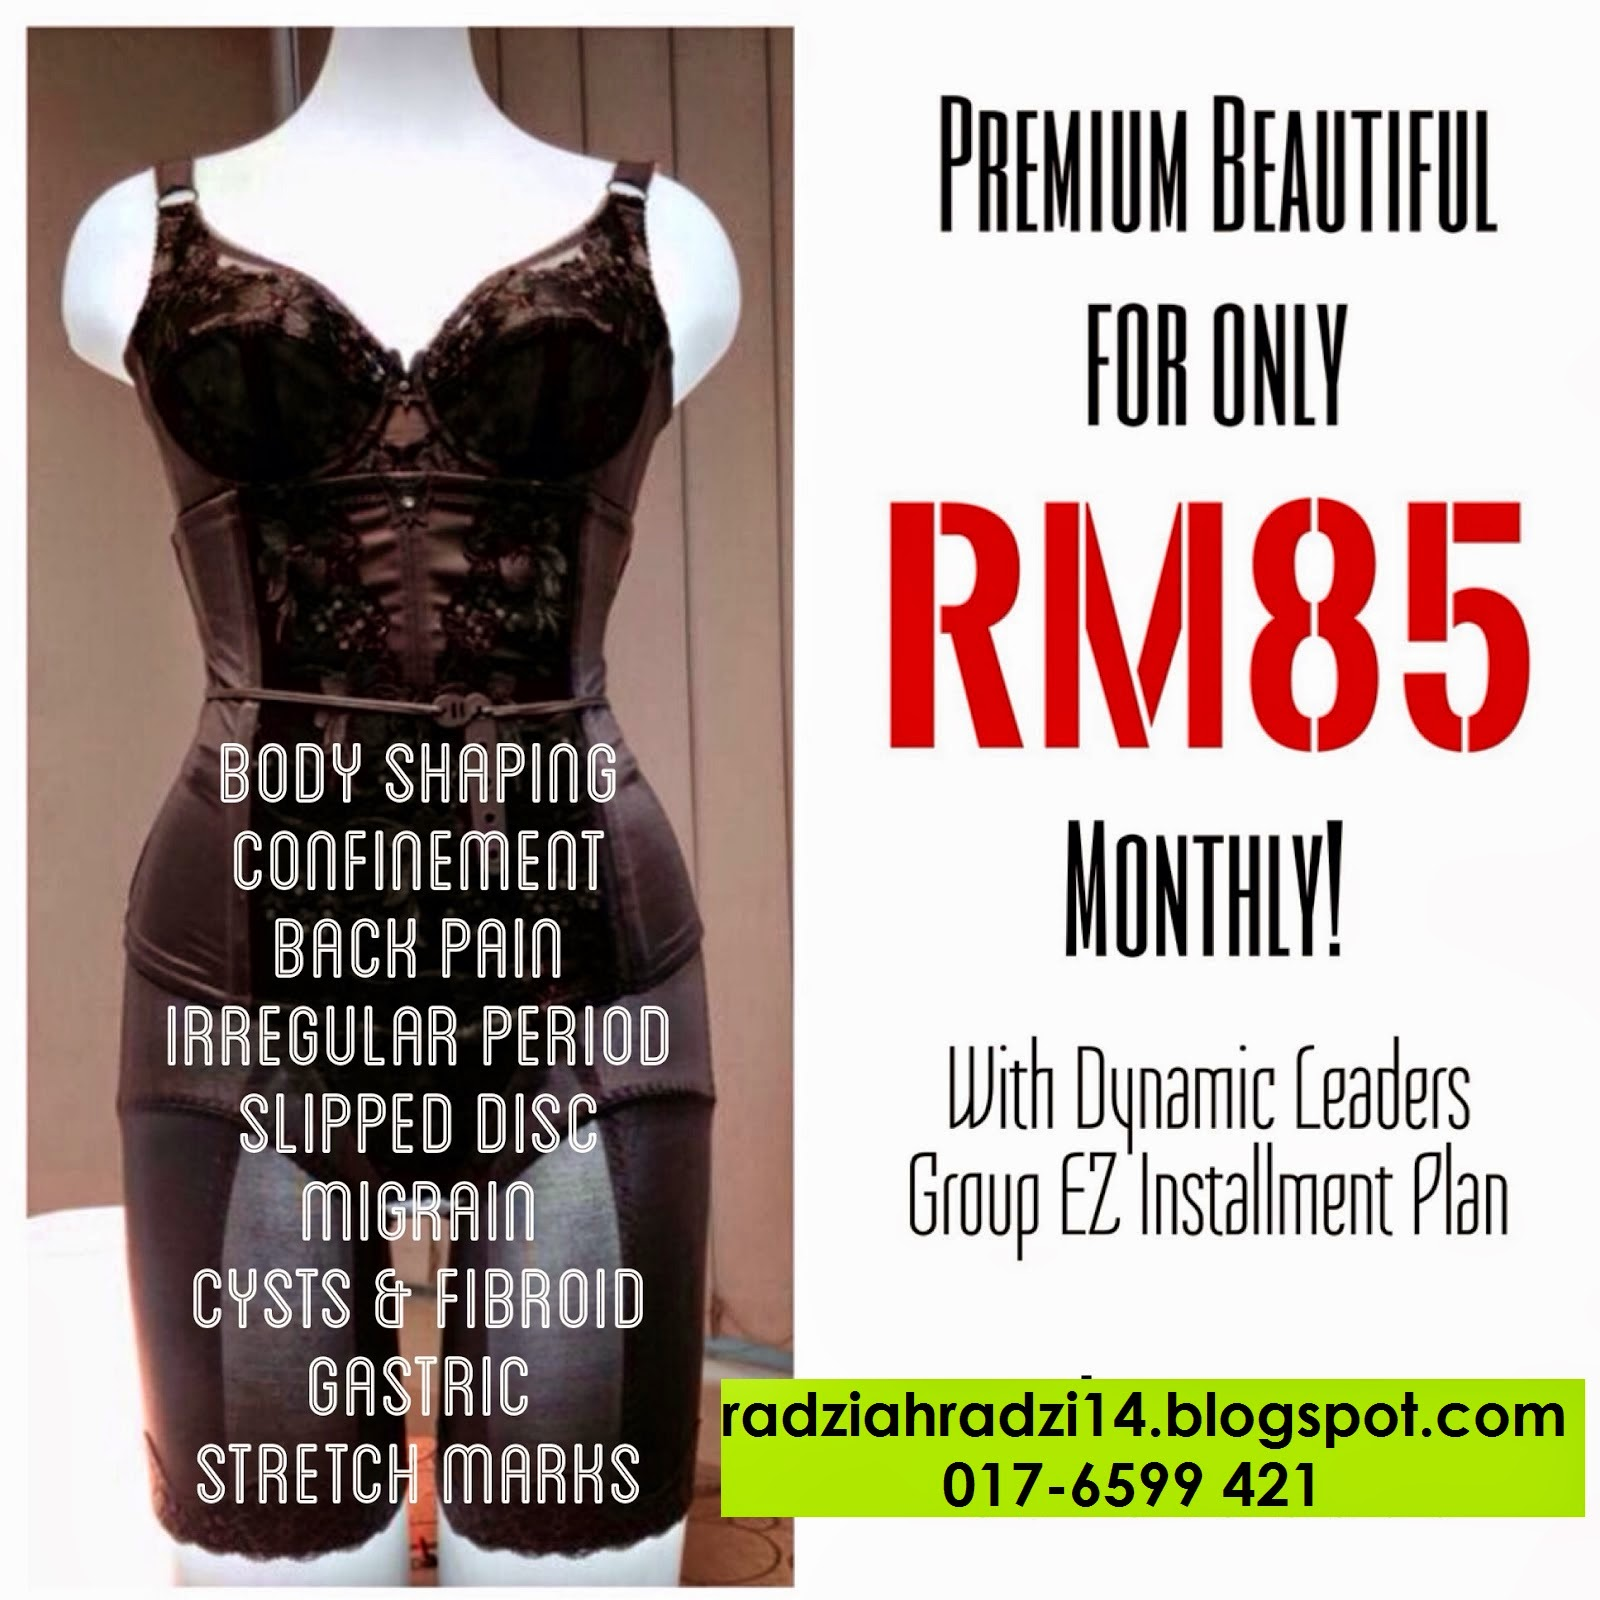 benefits, installment plan, premium beautiful, premium beautiful corset, premium beautiful elegance, promosi, sakit belakang, slipped disc, bengkung, ansuran